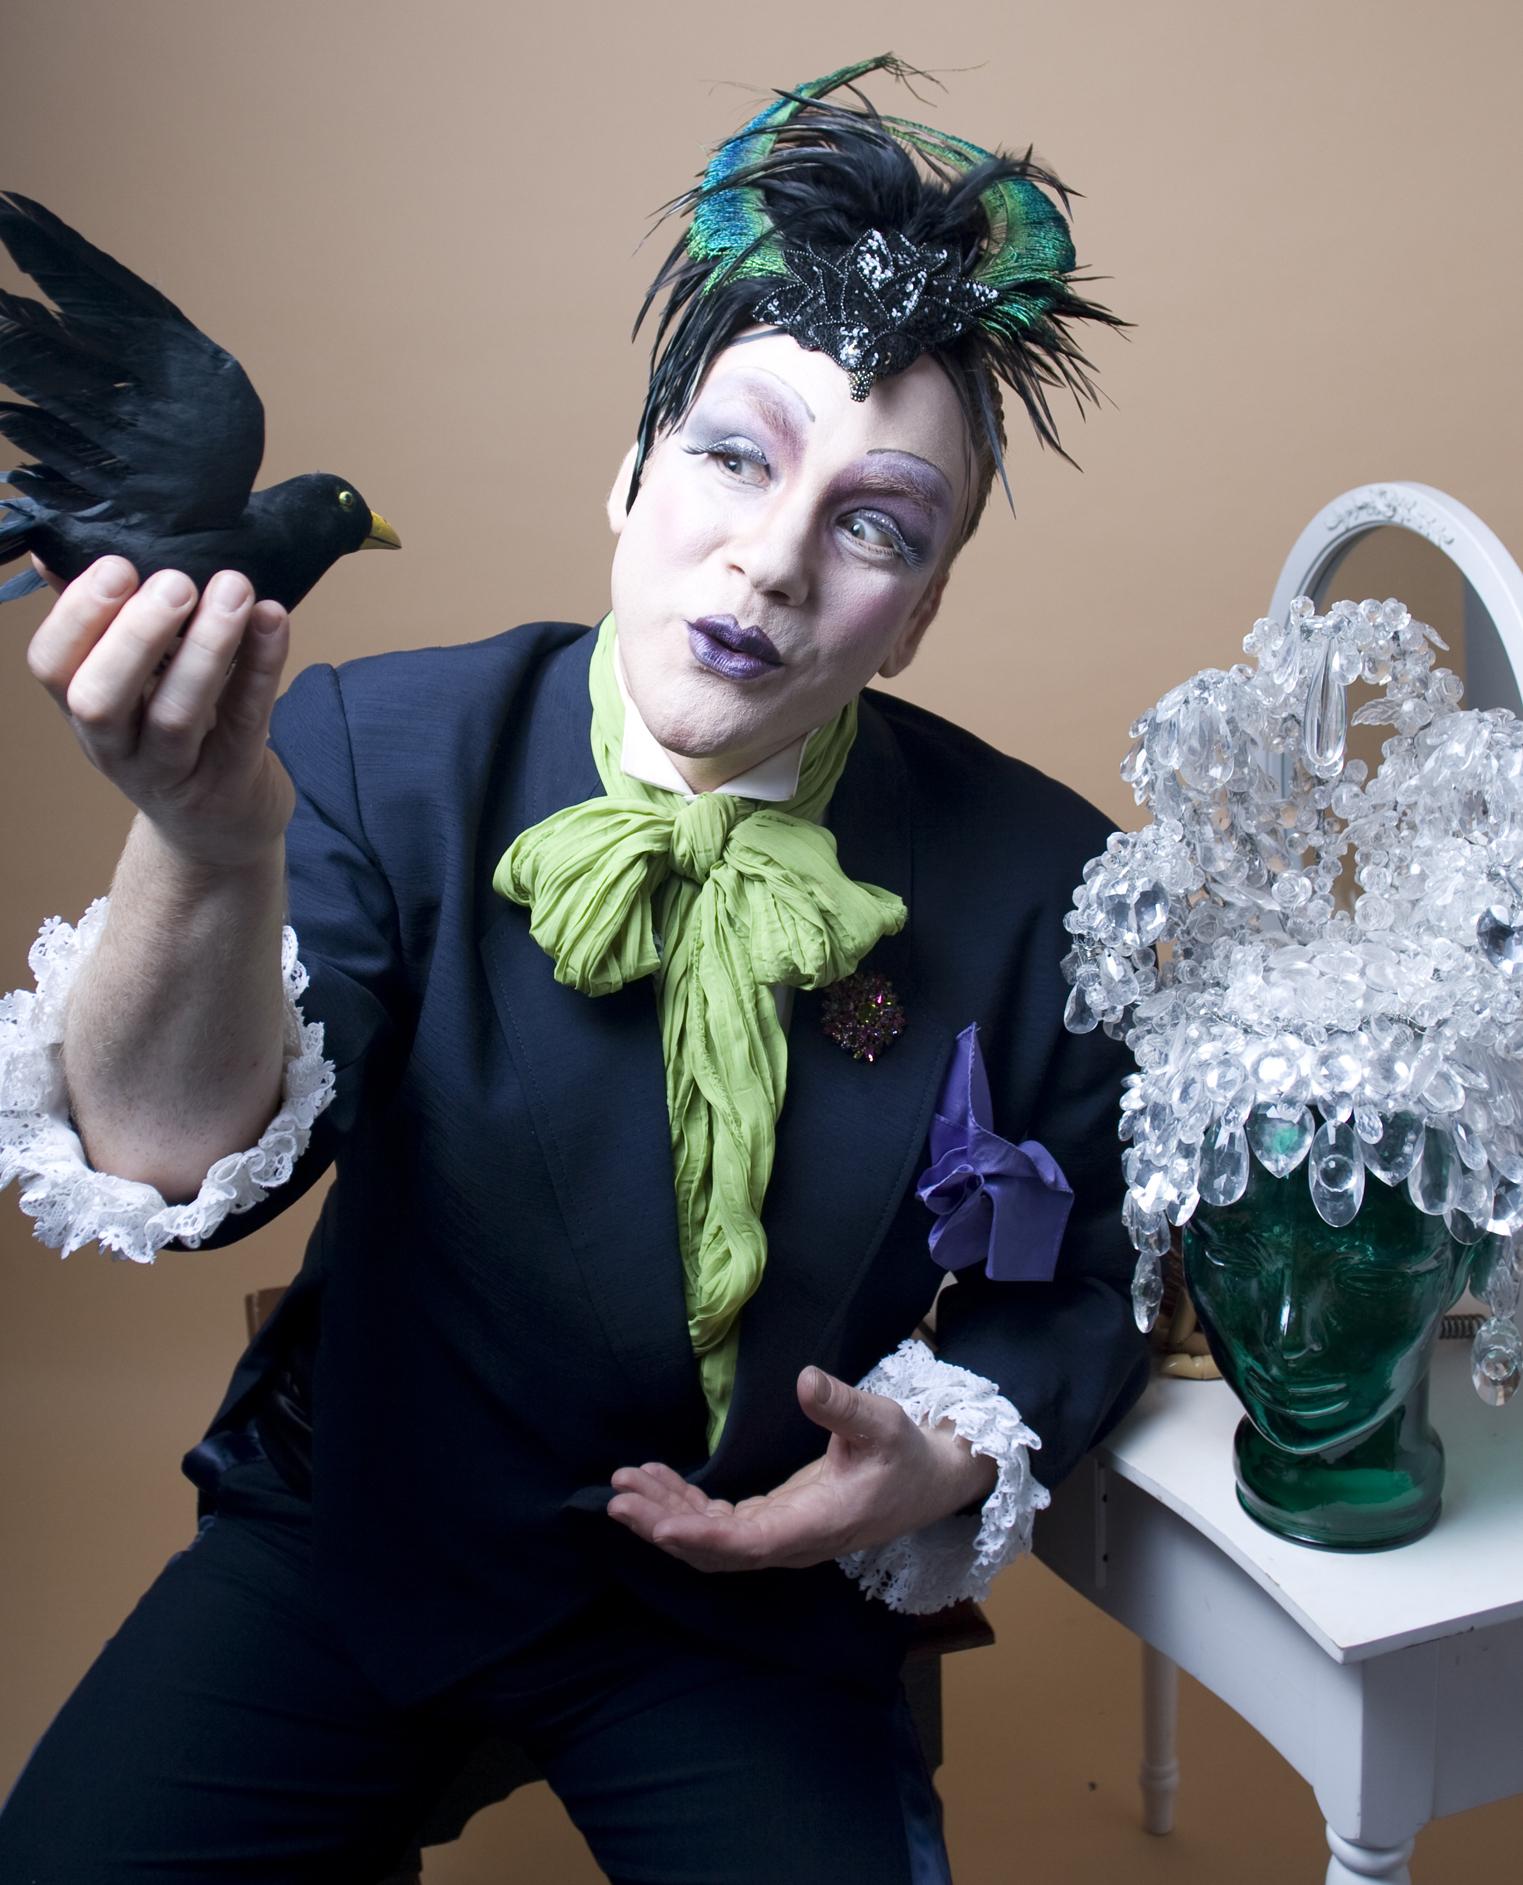 Blackbird-SethEisen-KEY-Photo_PhilipRingler727 (1).jpg